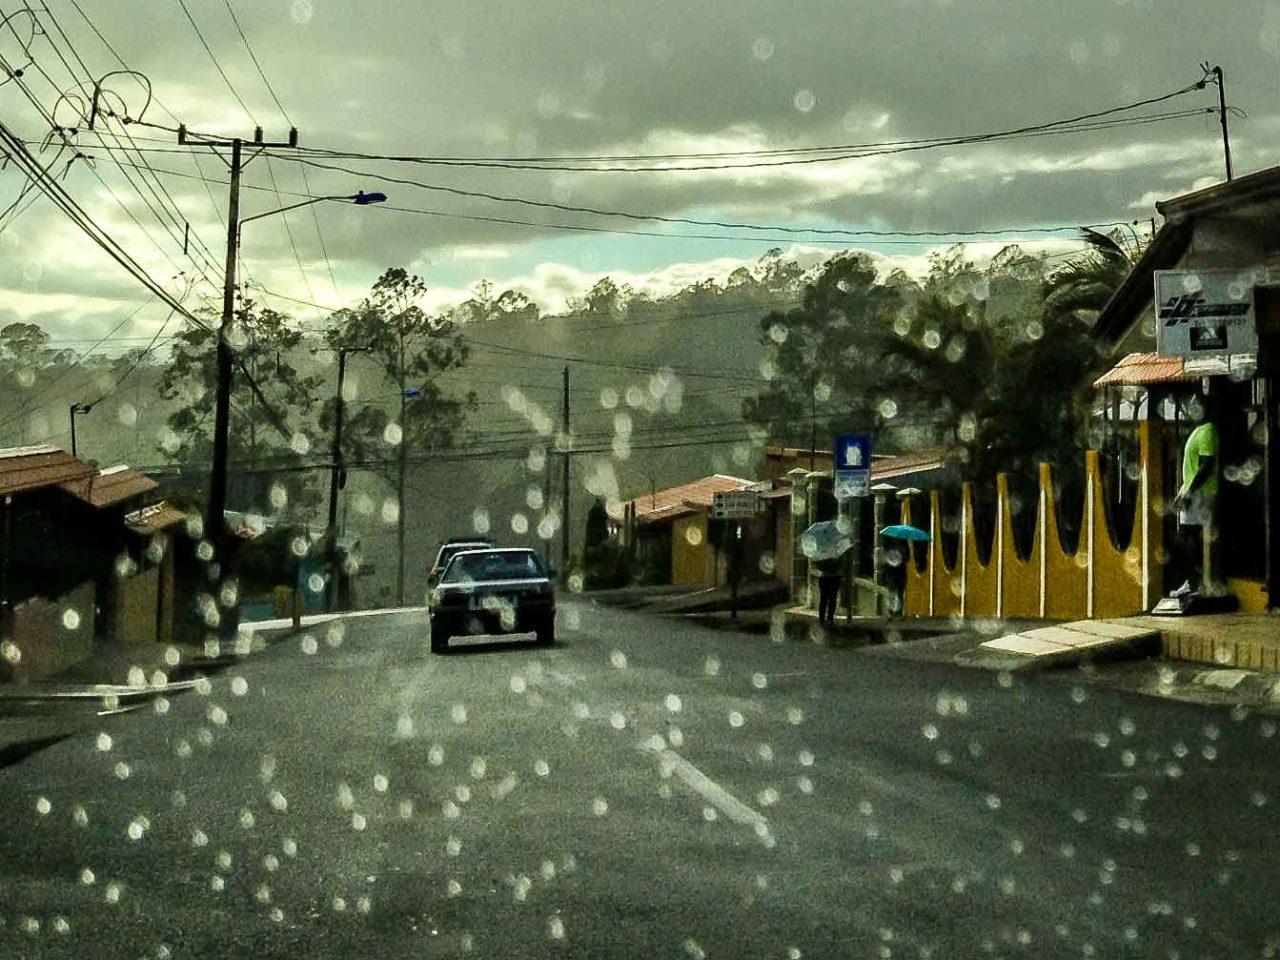 rainy day in heredia costa rica